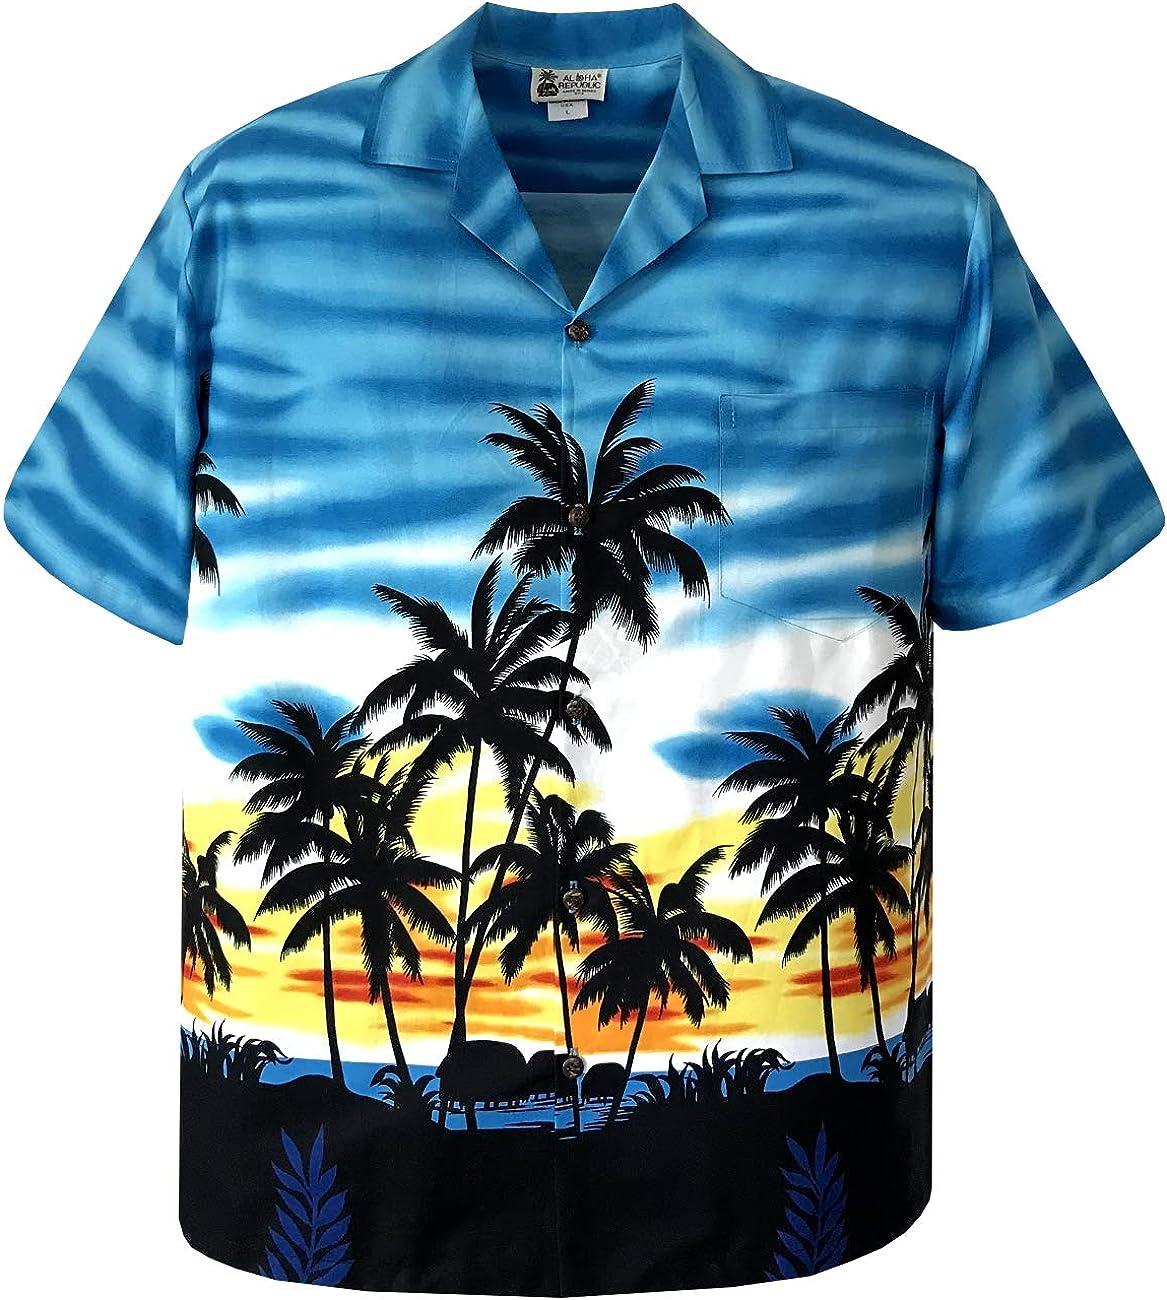 Tropical Hawaiian Sunset Palm Popular brand Trees Panoramic Max 80% OFF Aloha Shirt Design